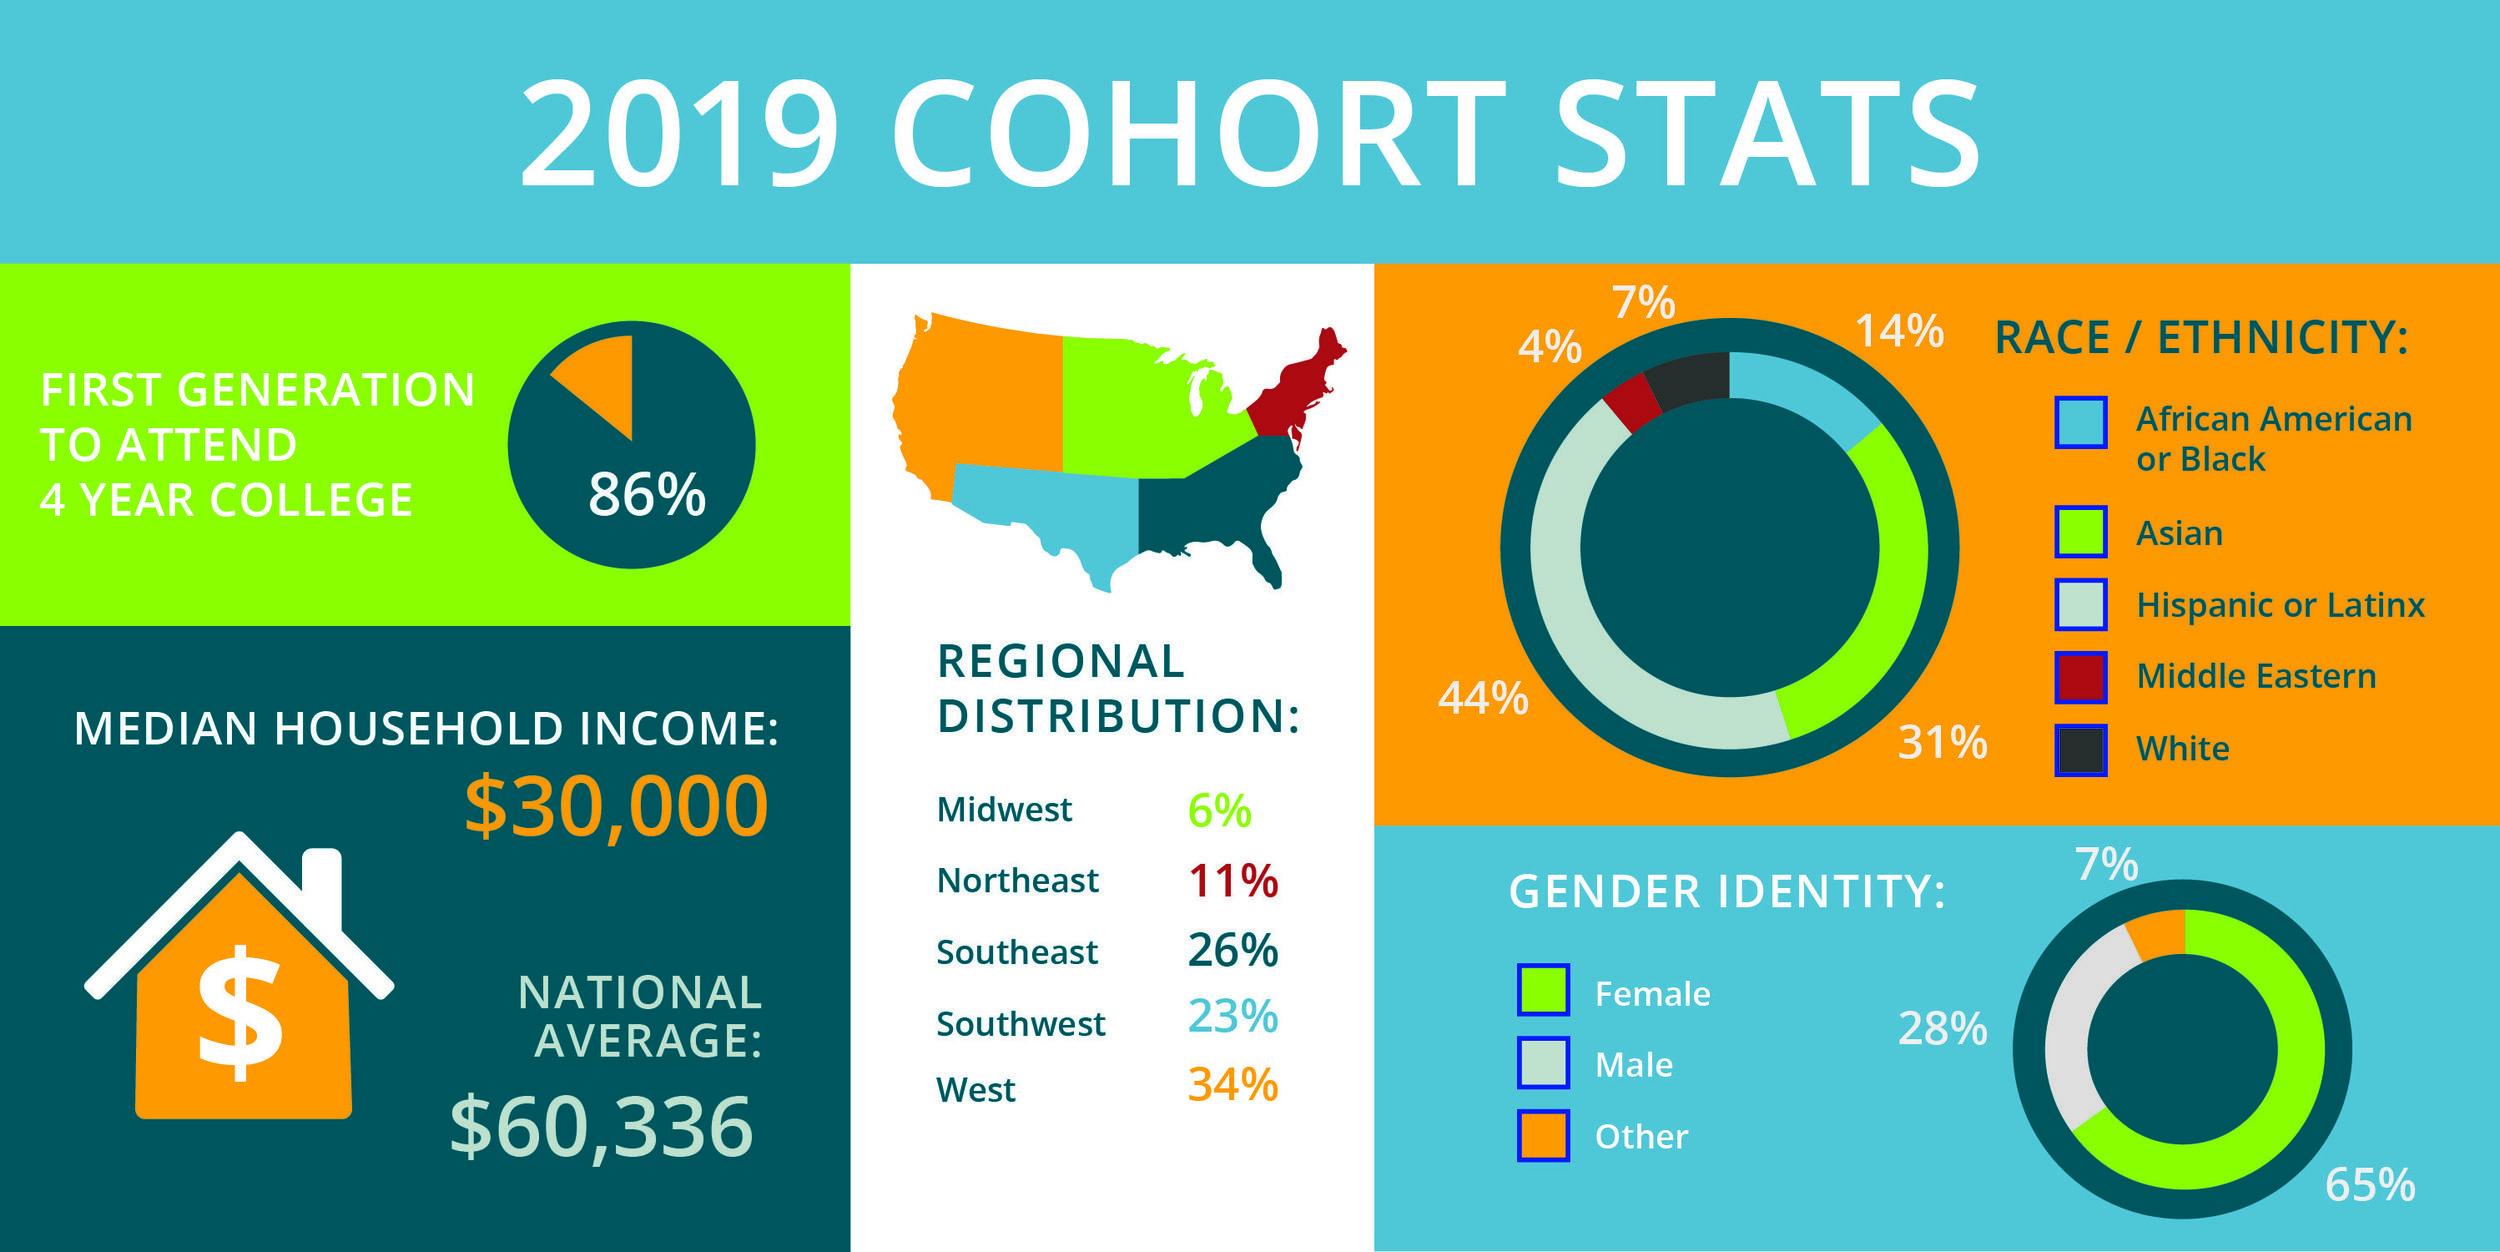 2019 Cohort Stats.jpg